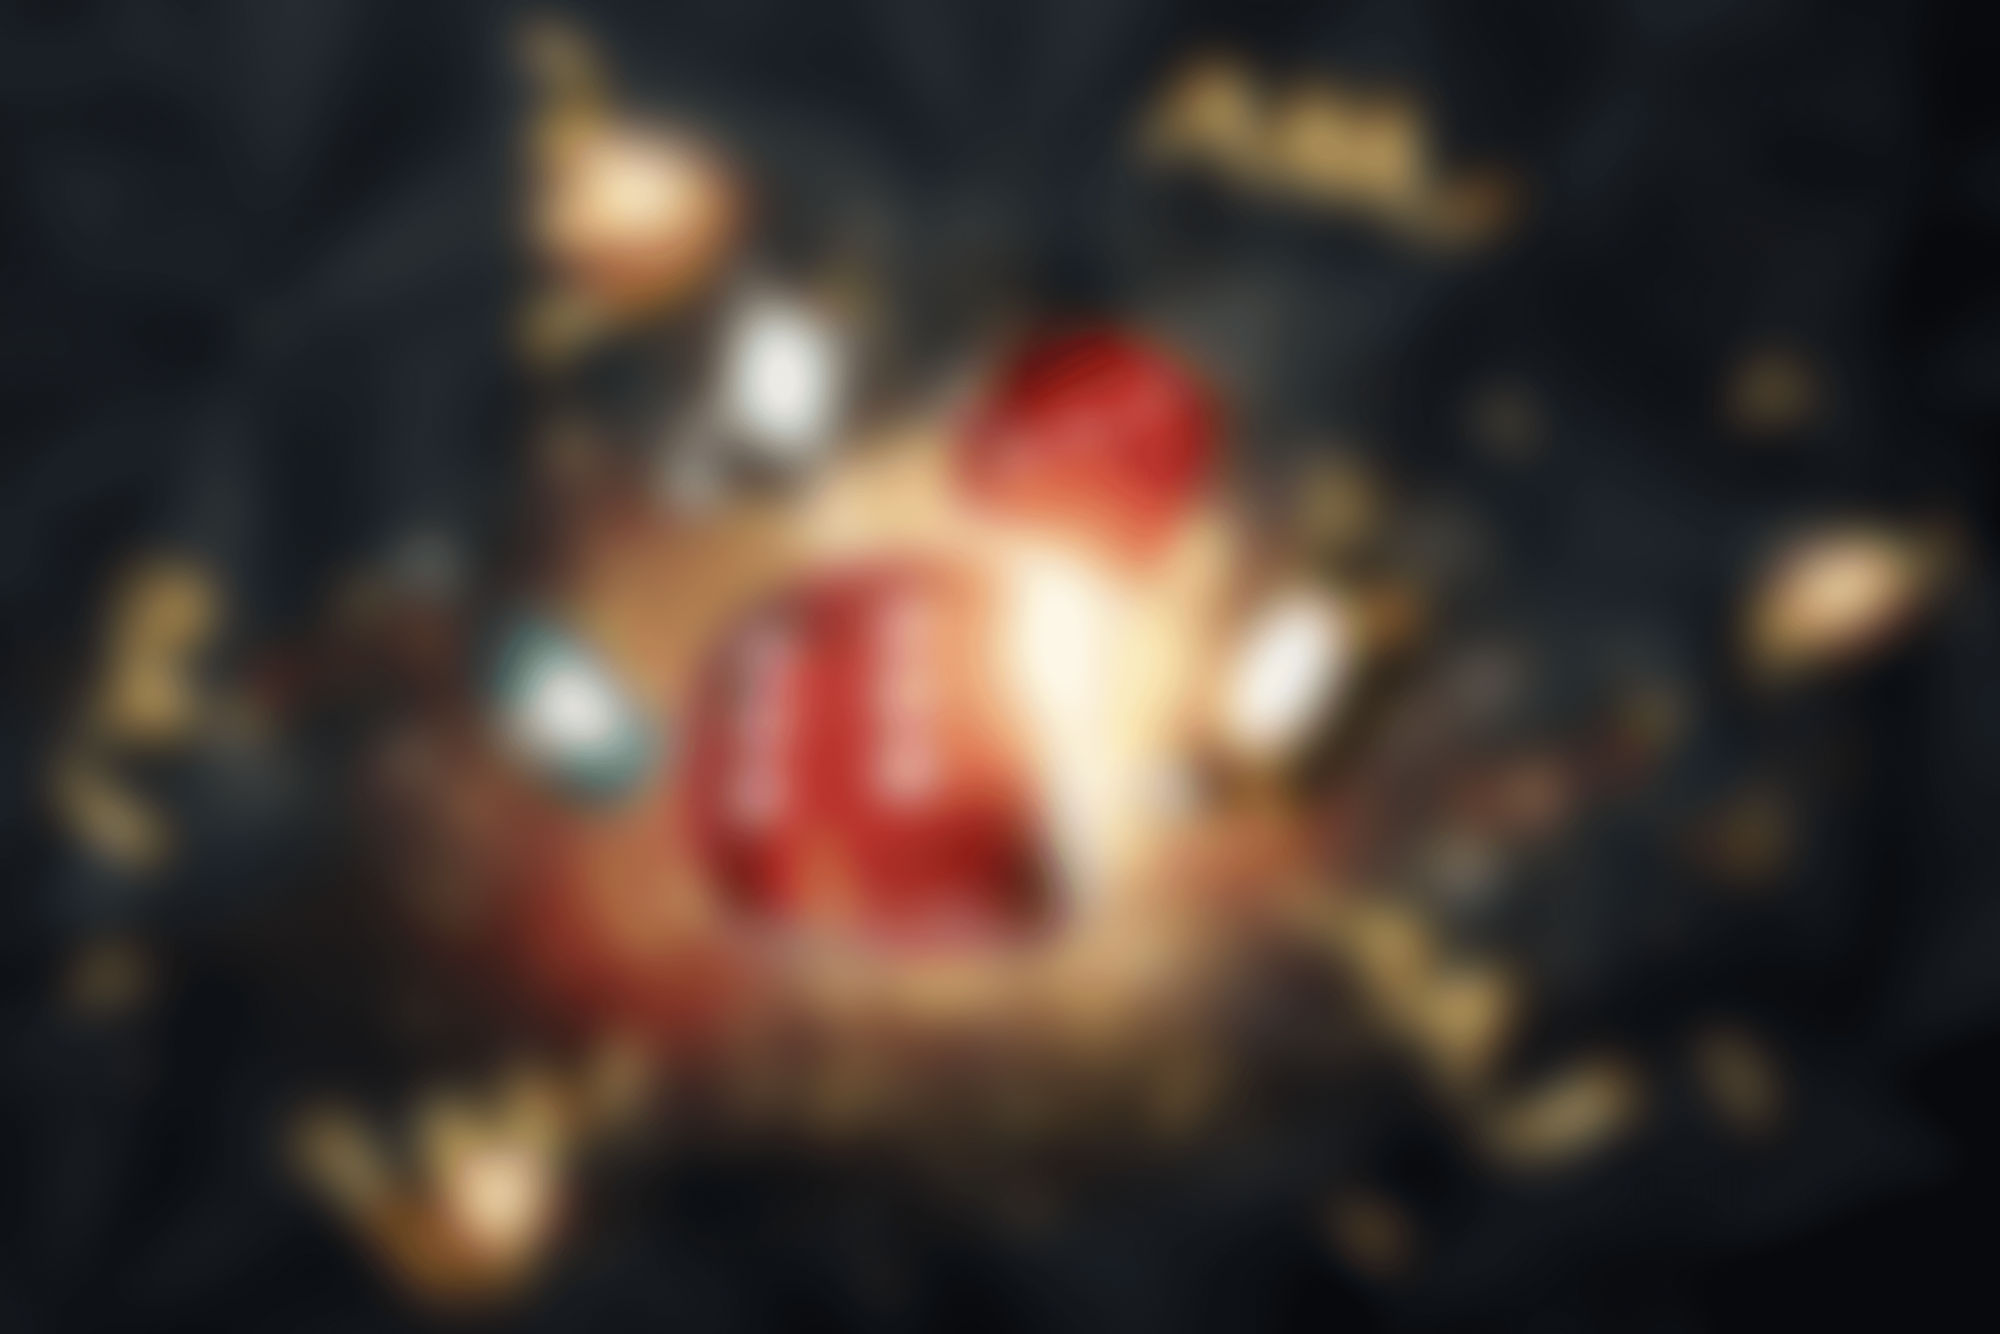 bonus image